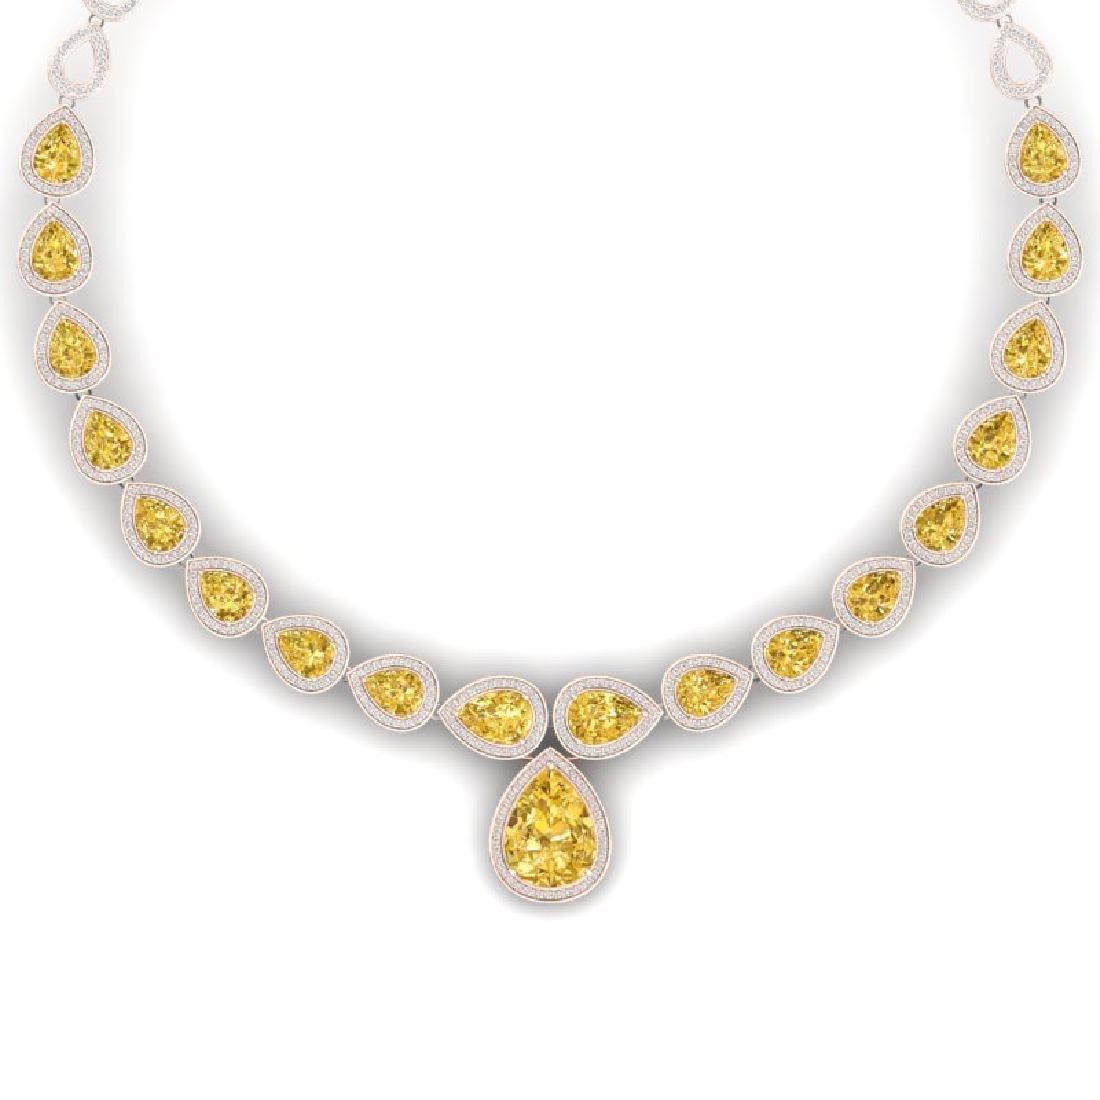 48.24 CTW Royalty Canary Citrine & VS Diamond Necklace